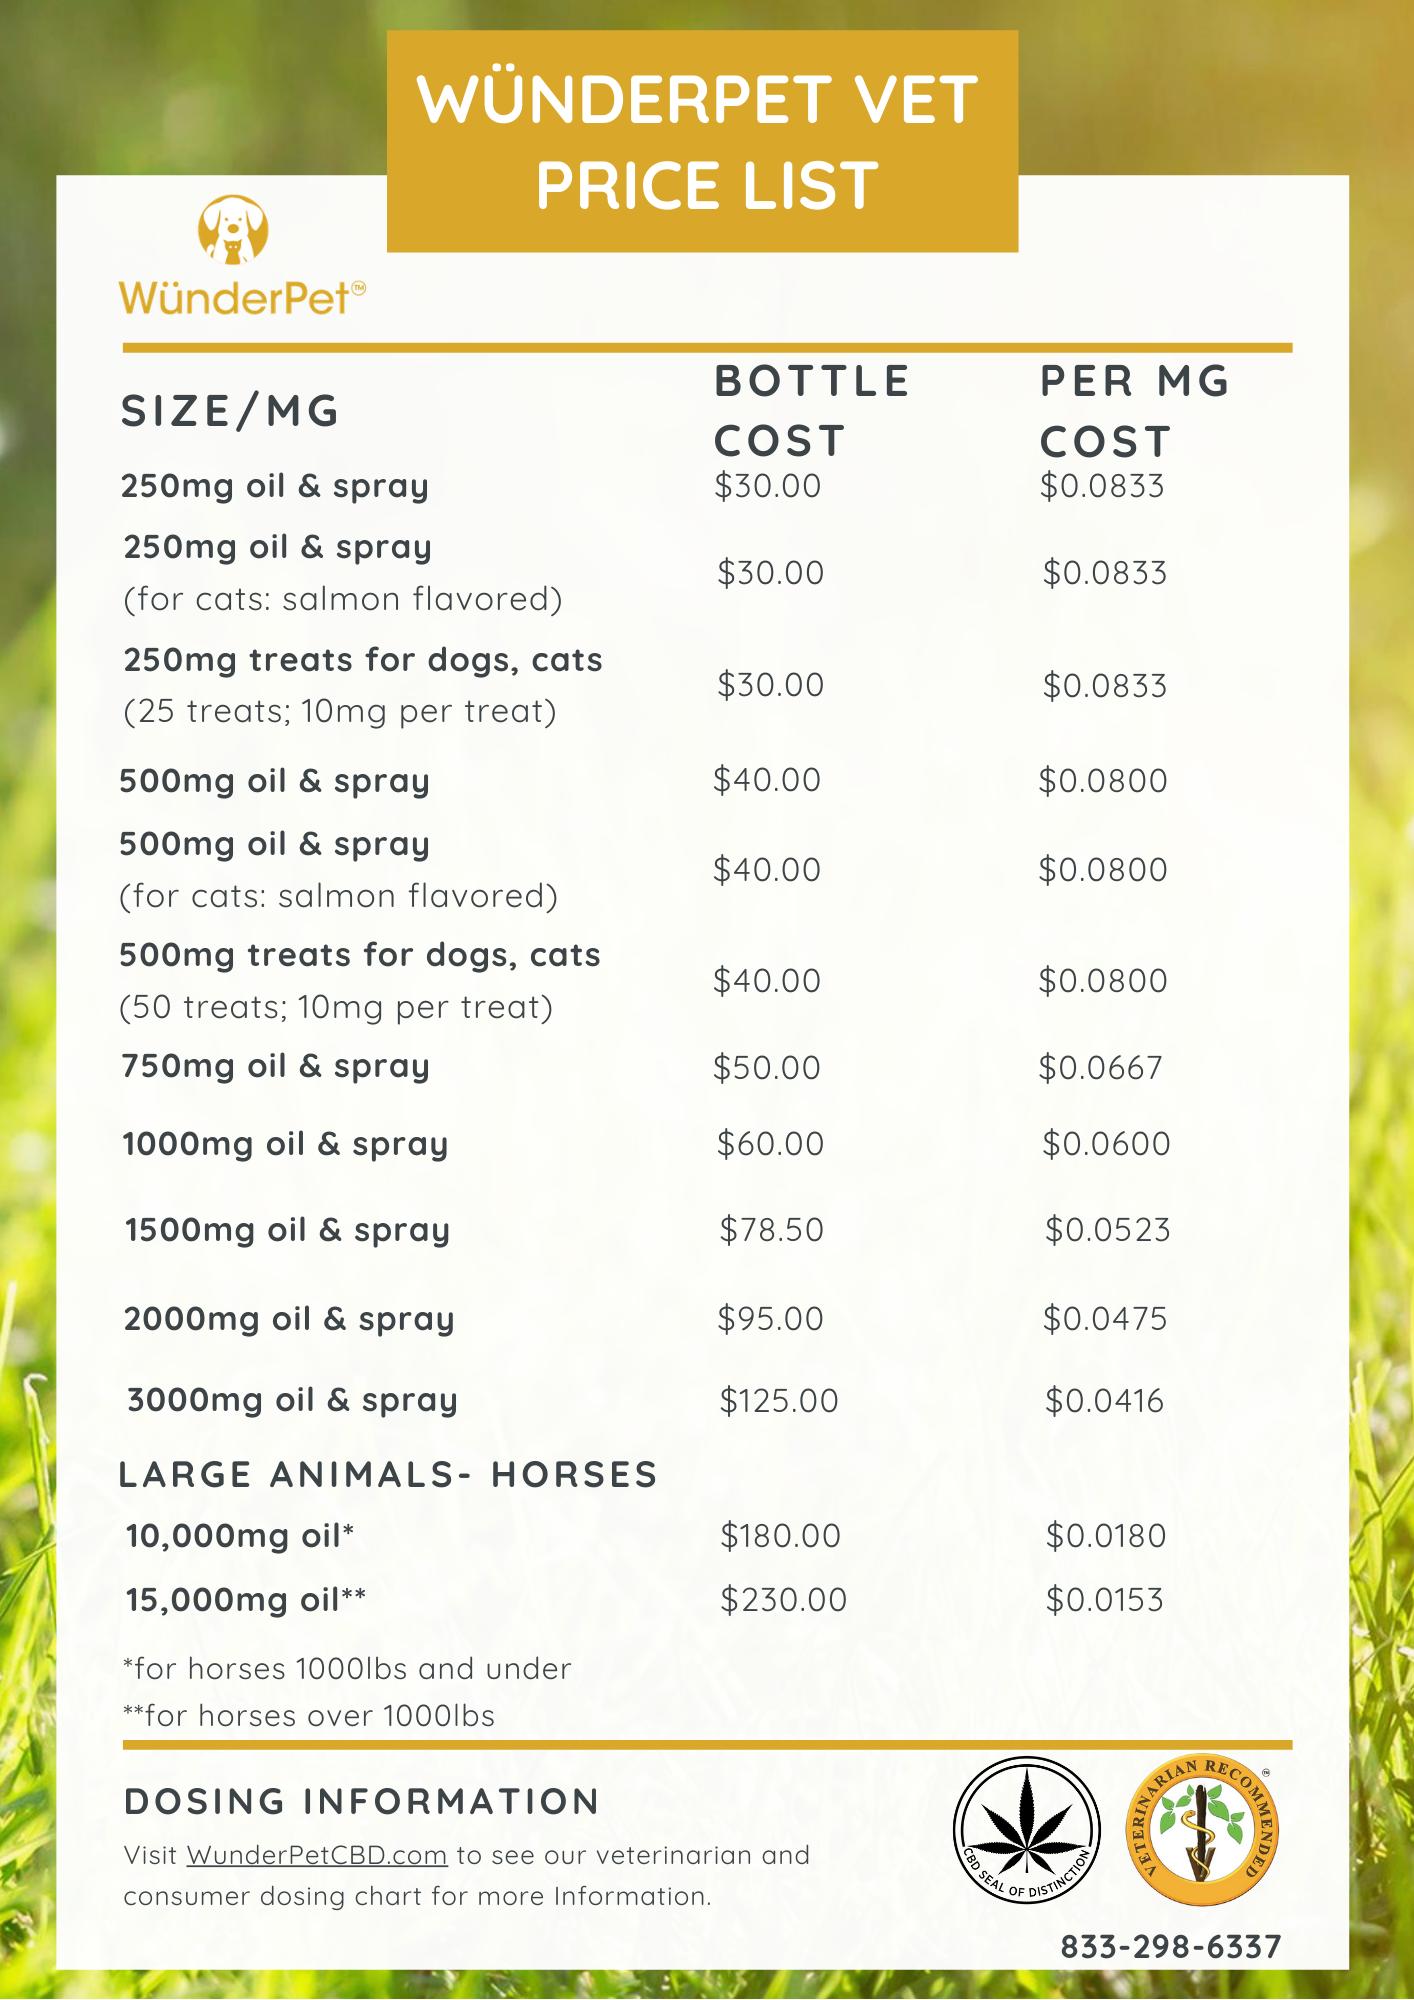 WünderPet Price List 9.2.20